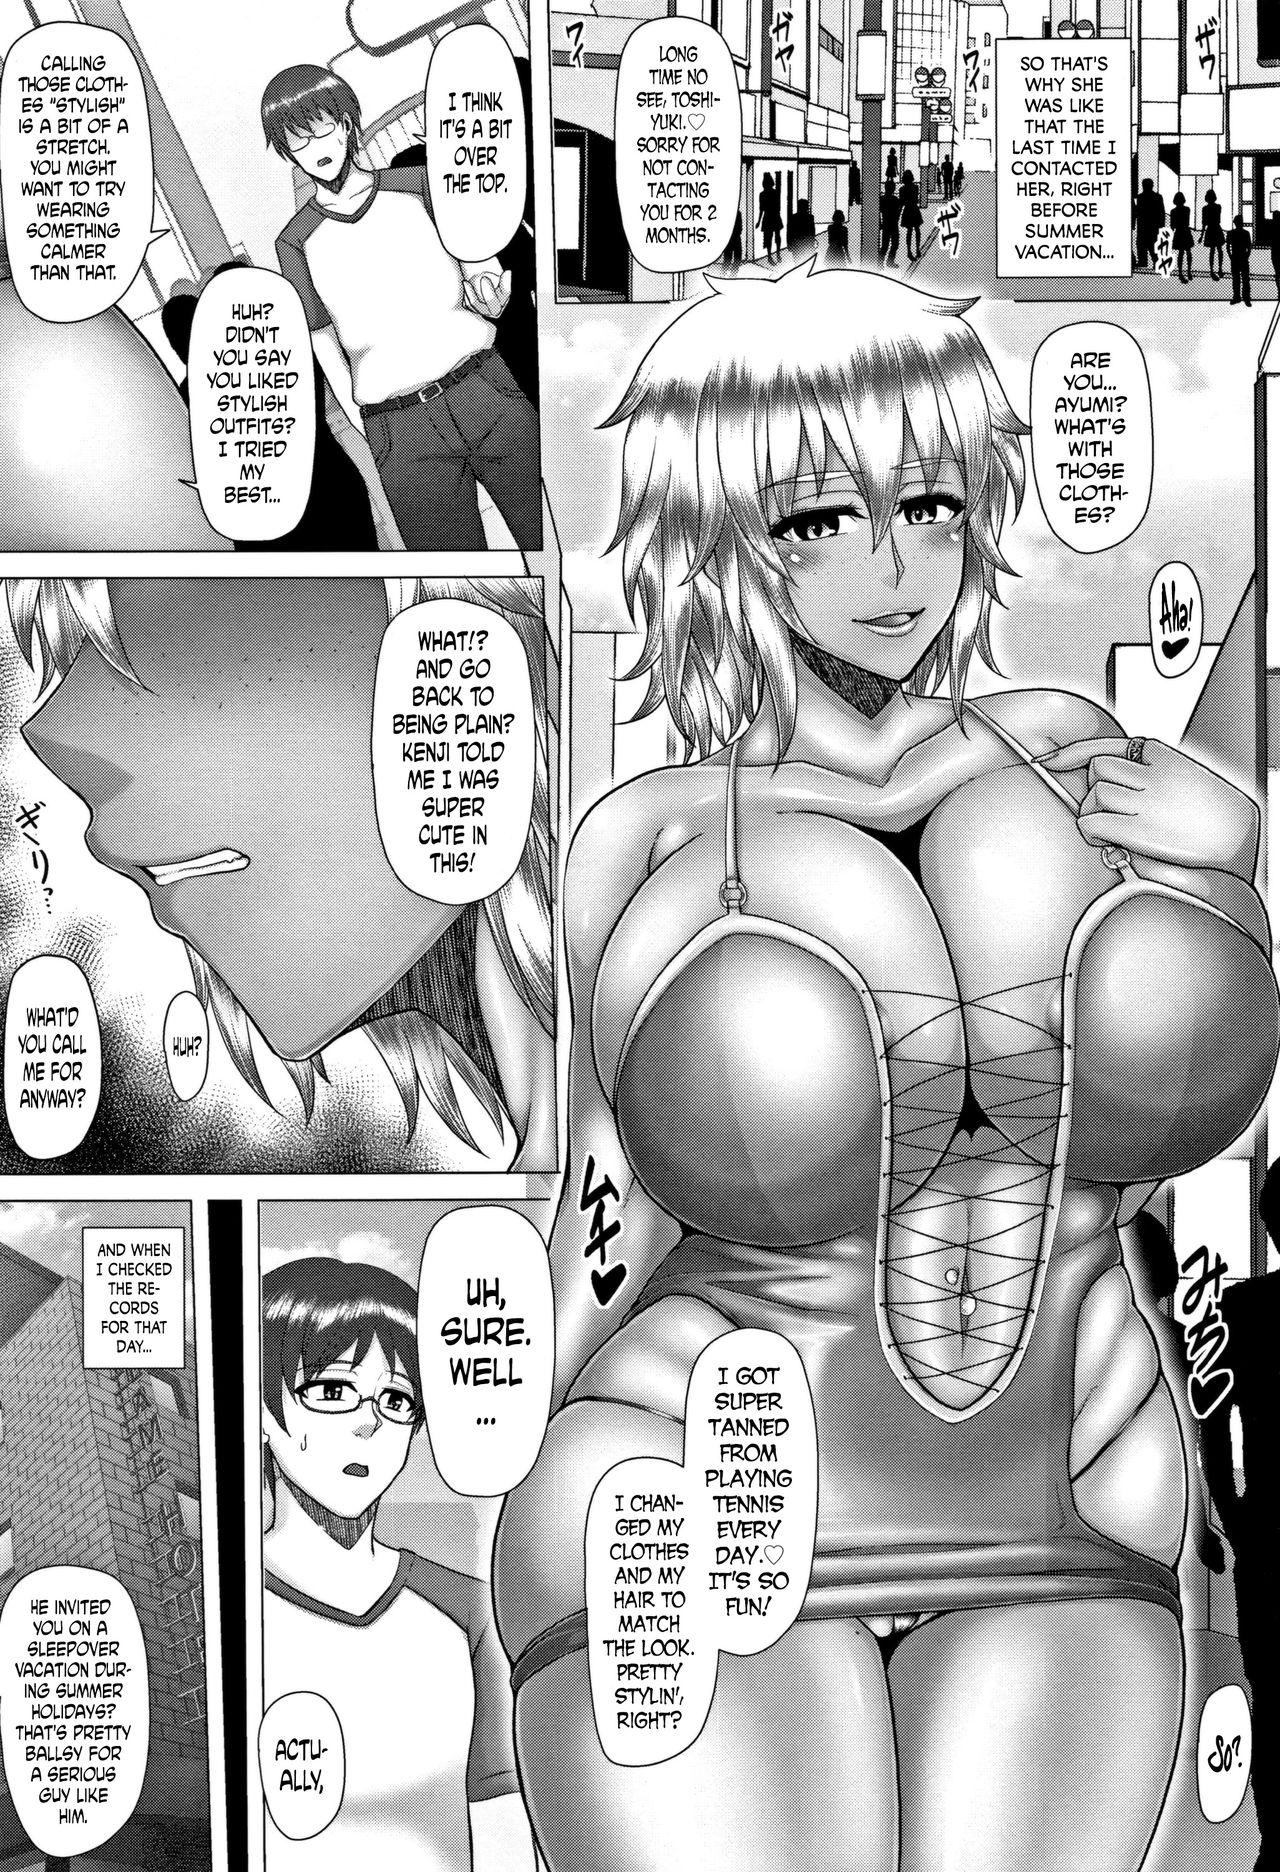 [Inoue Nanaki] Joushiki Daha! Kuro Gal Bitch-ka Seikatsu Ch. 1-3, 5-8 [English] [Dark Mac + N04h] 12